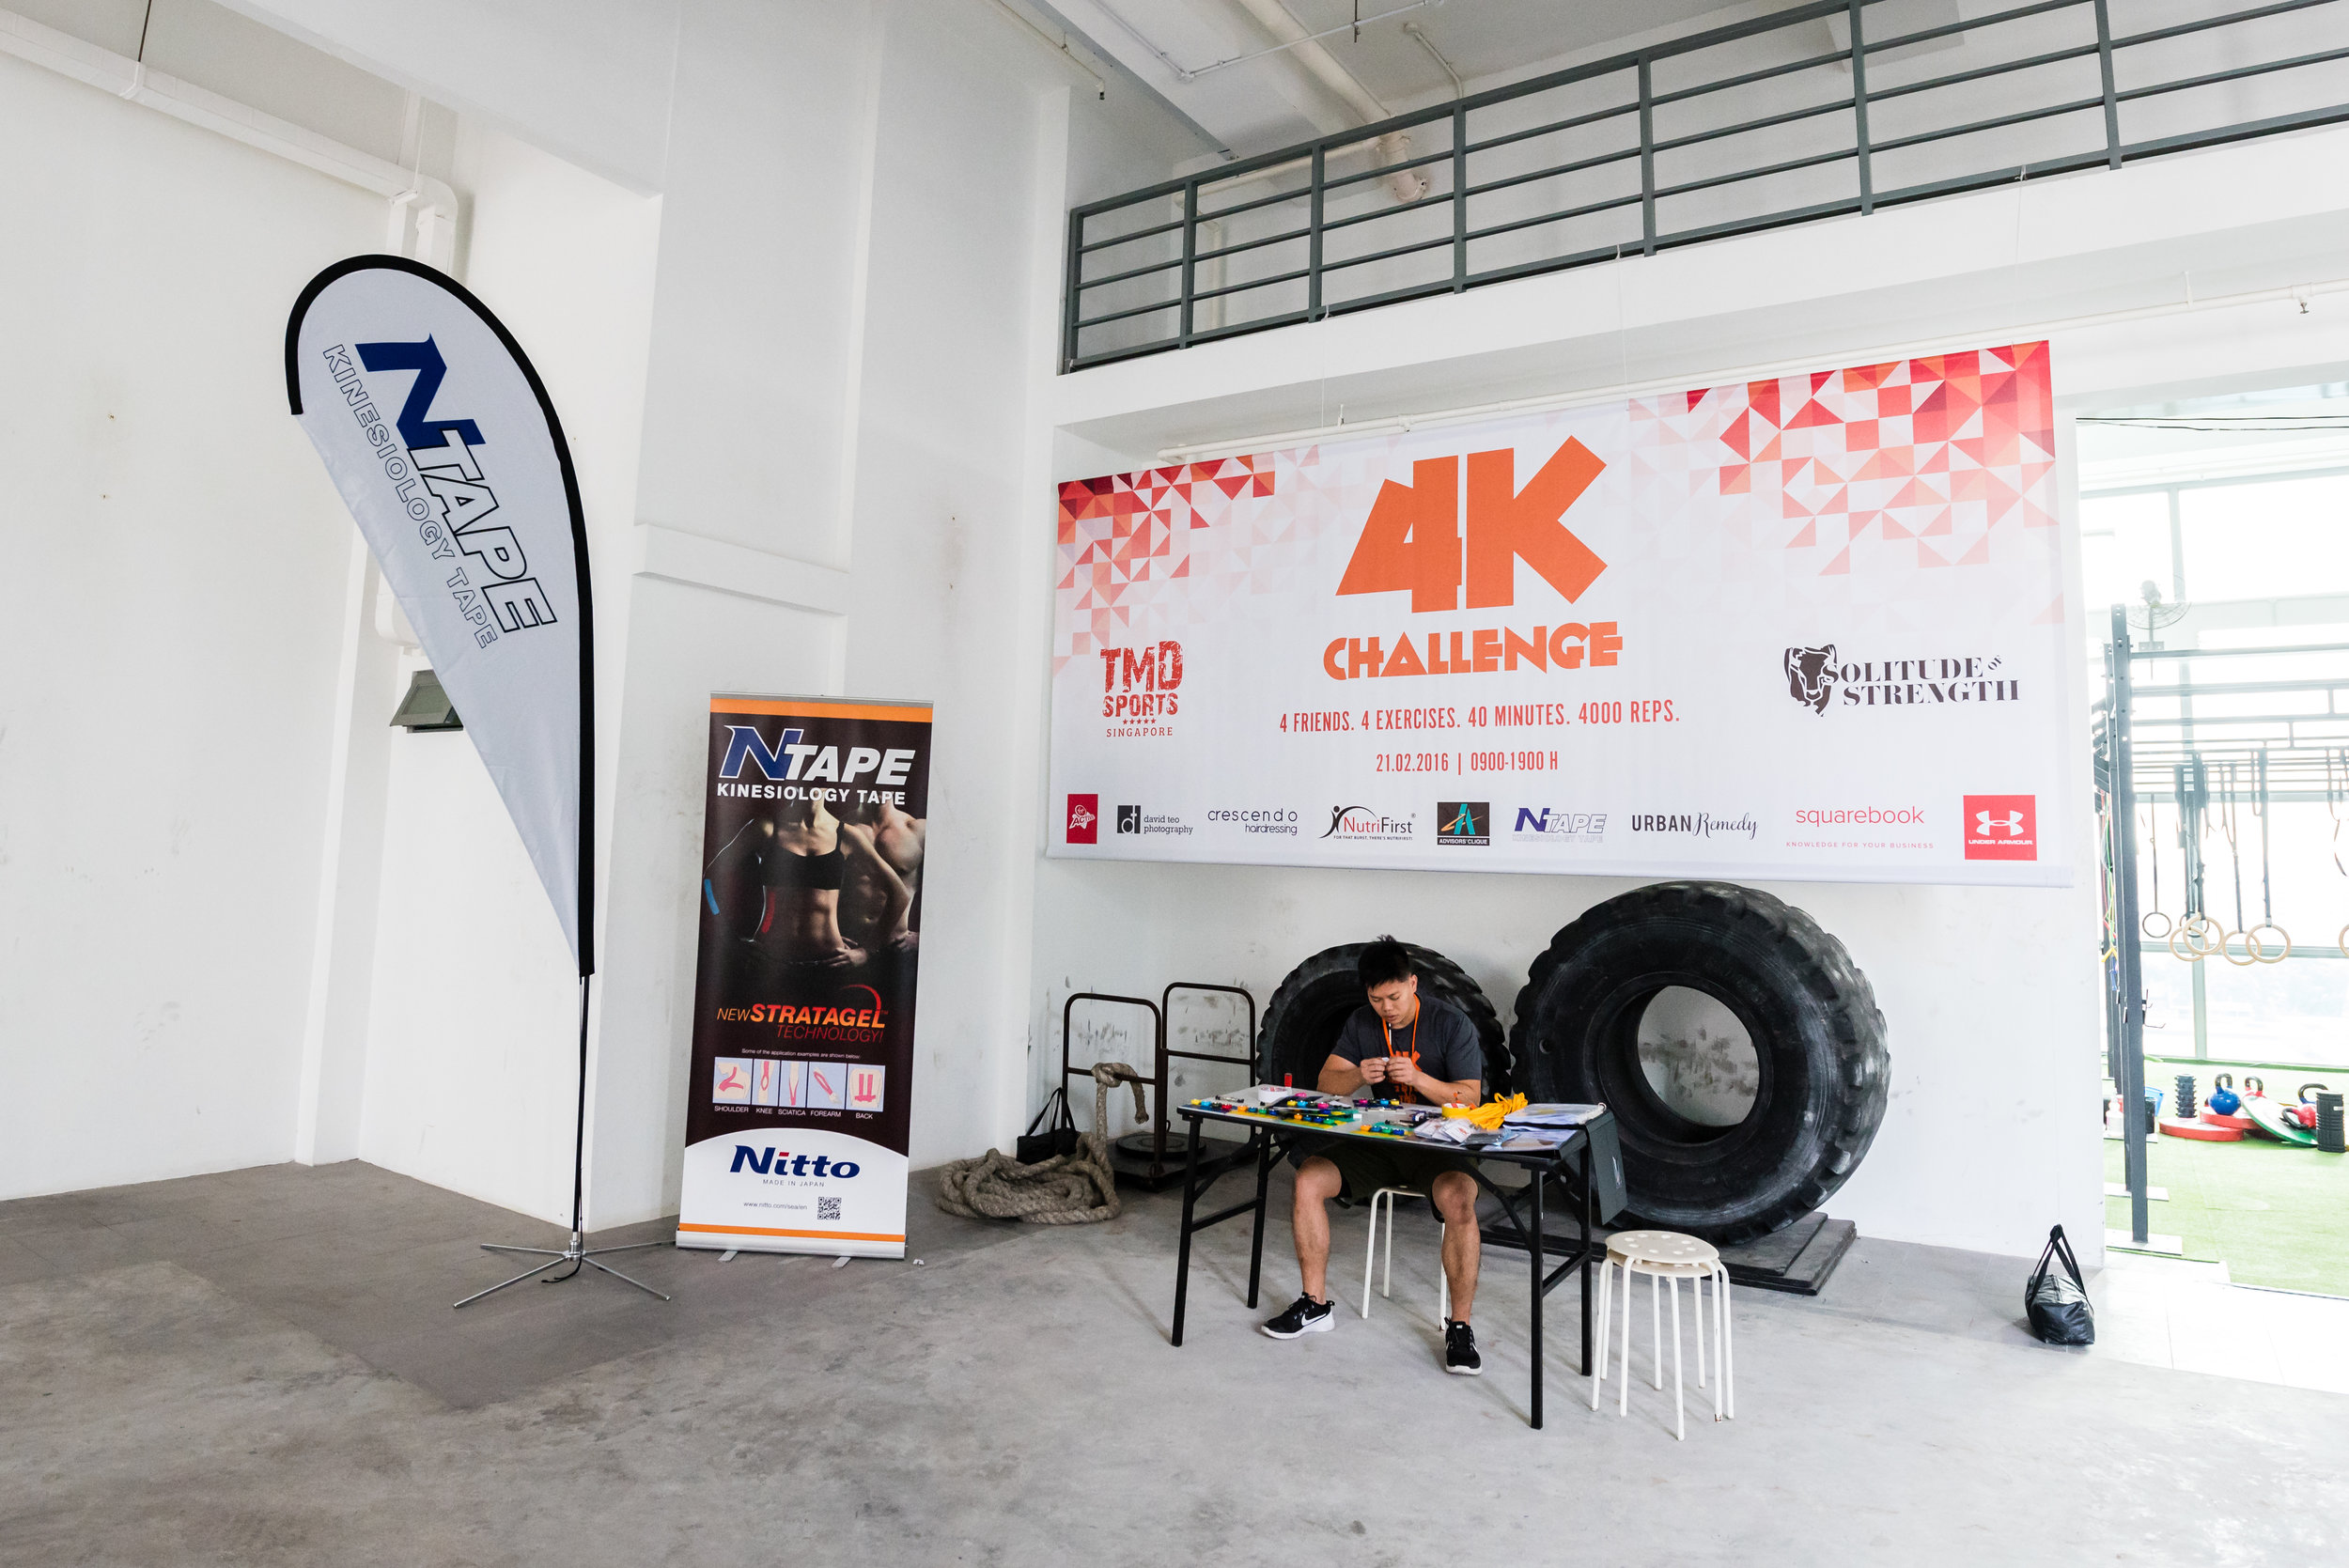 TMD 4K Challenge 2016 (9 of 348).jpg